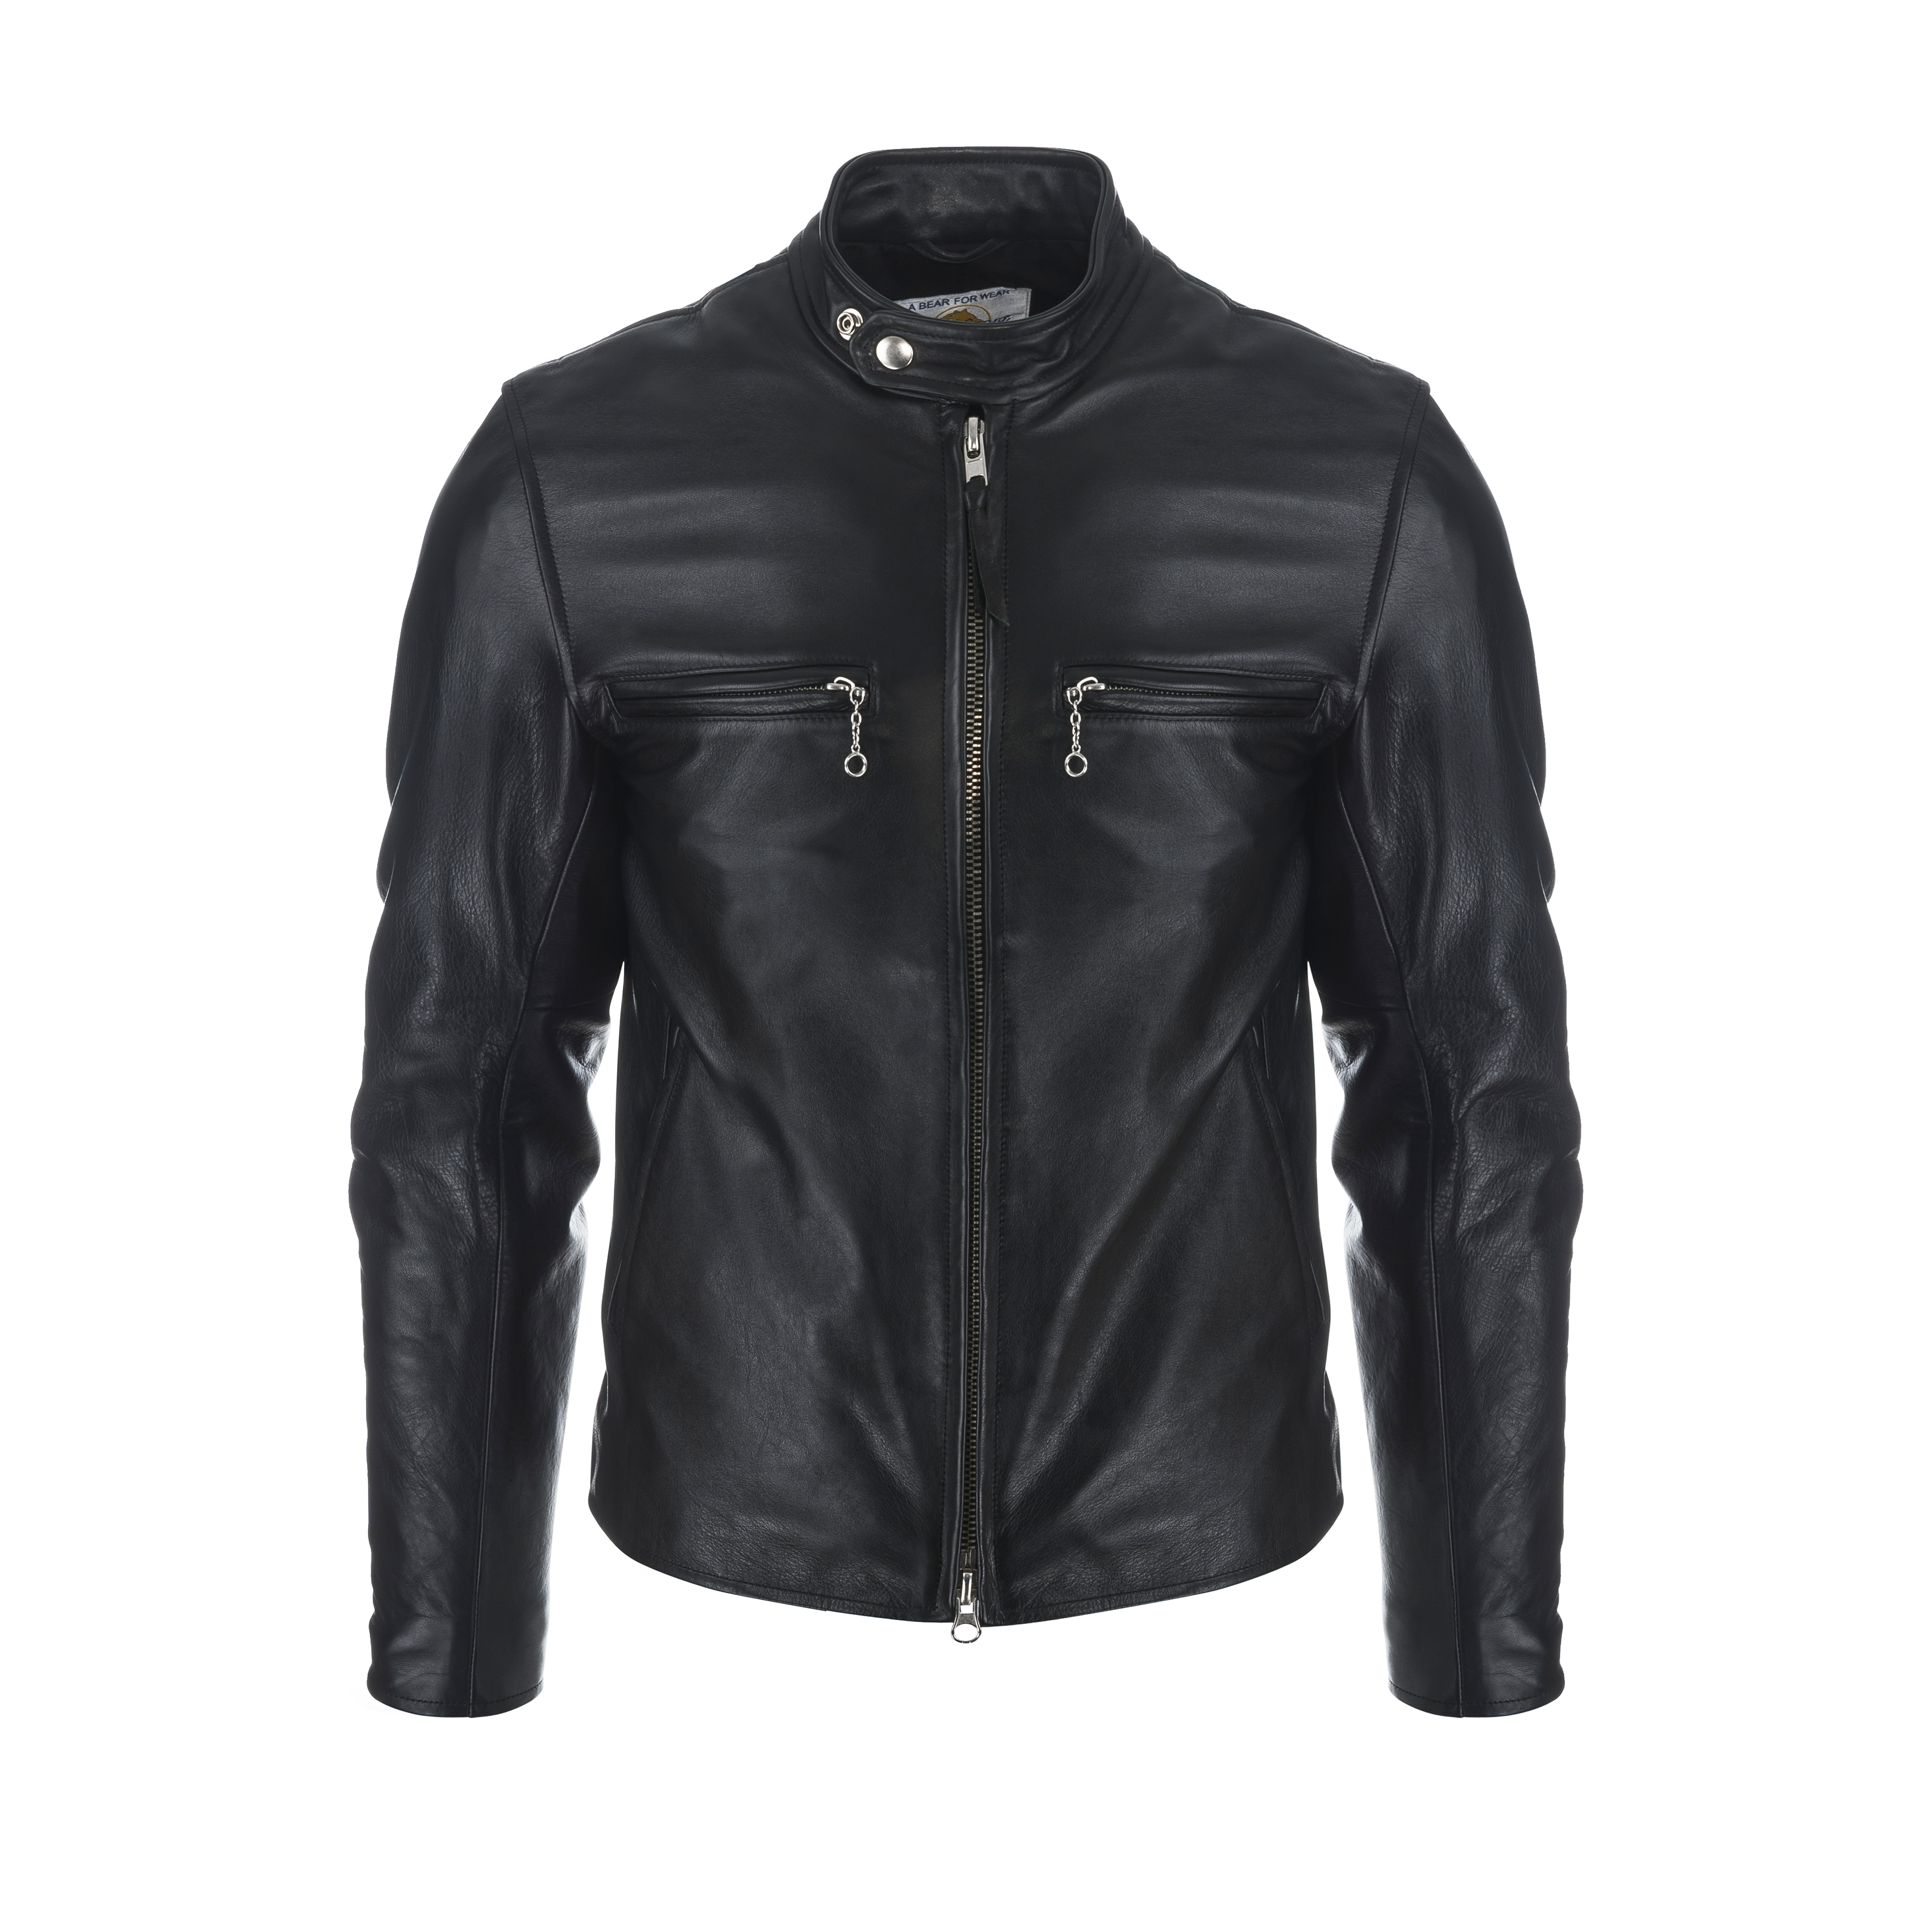 Slim Fit Banded Collar Motorcycle Jacket Black